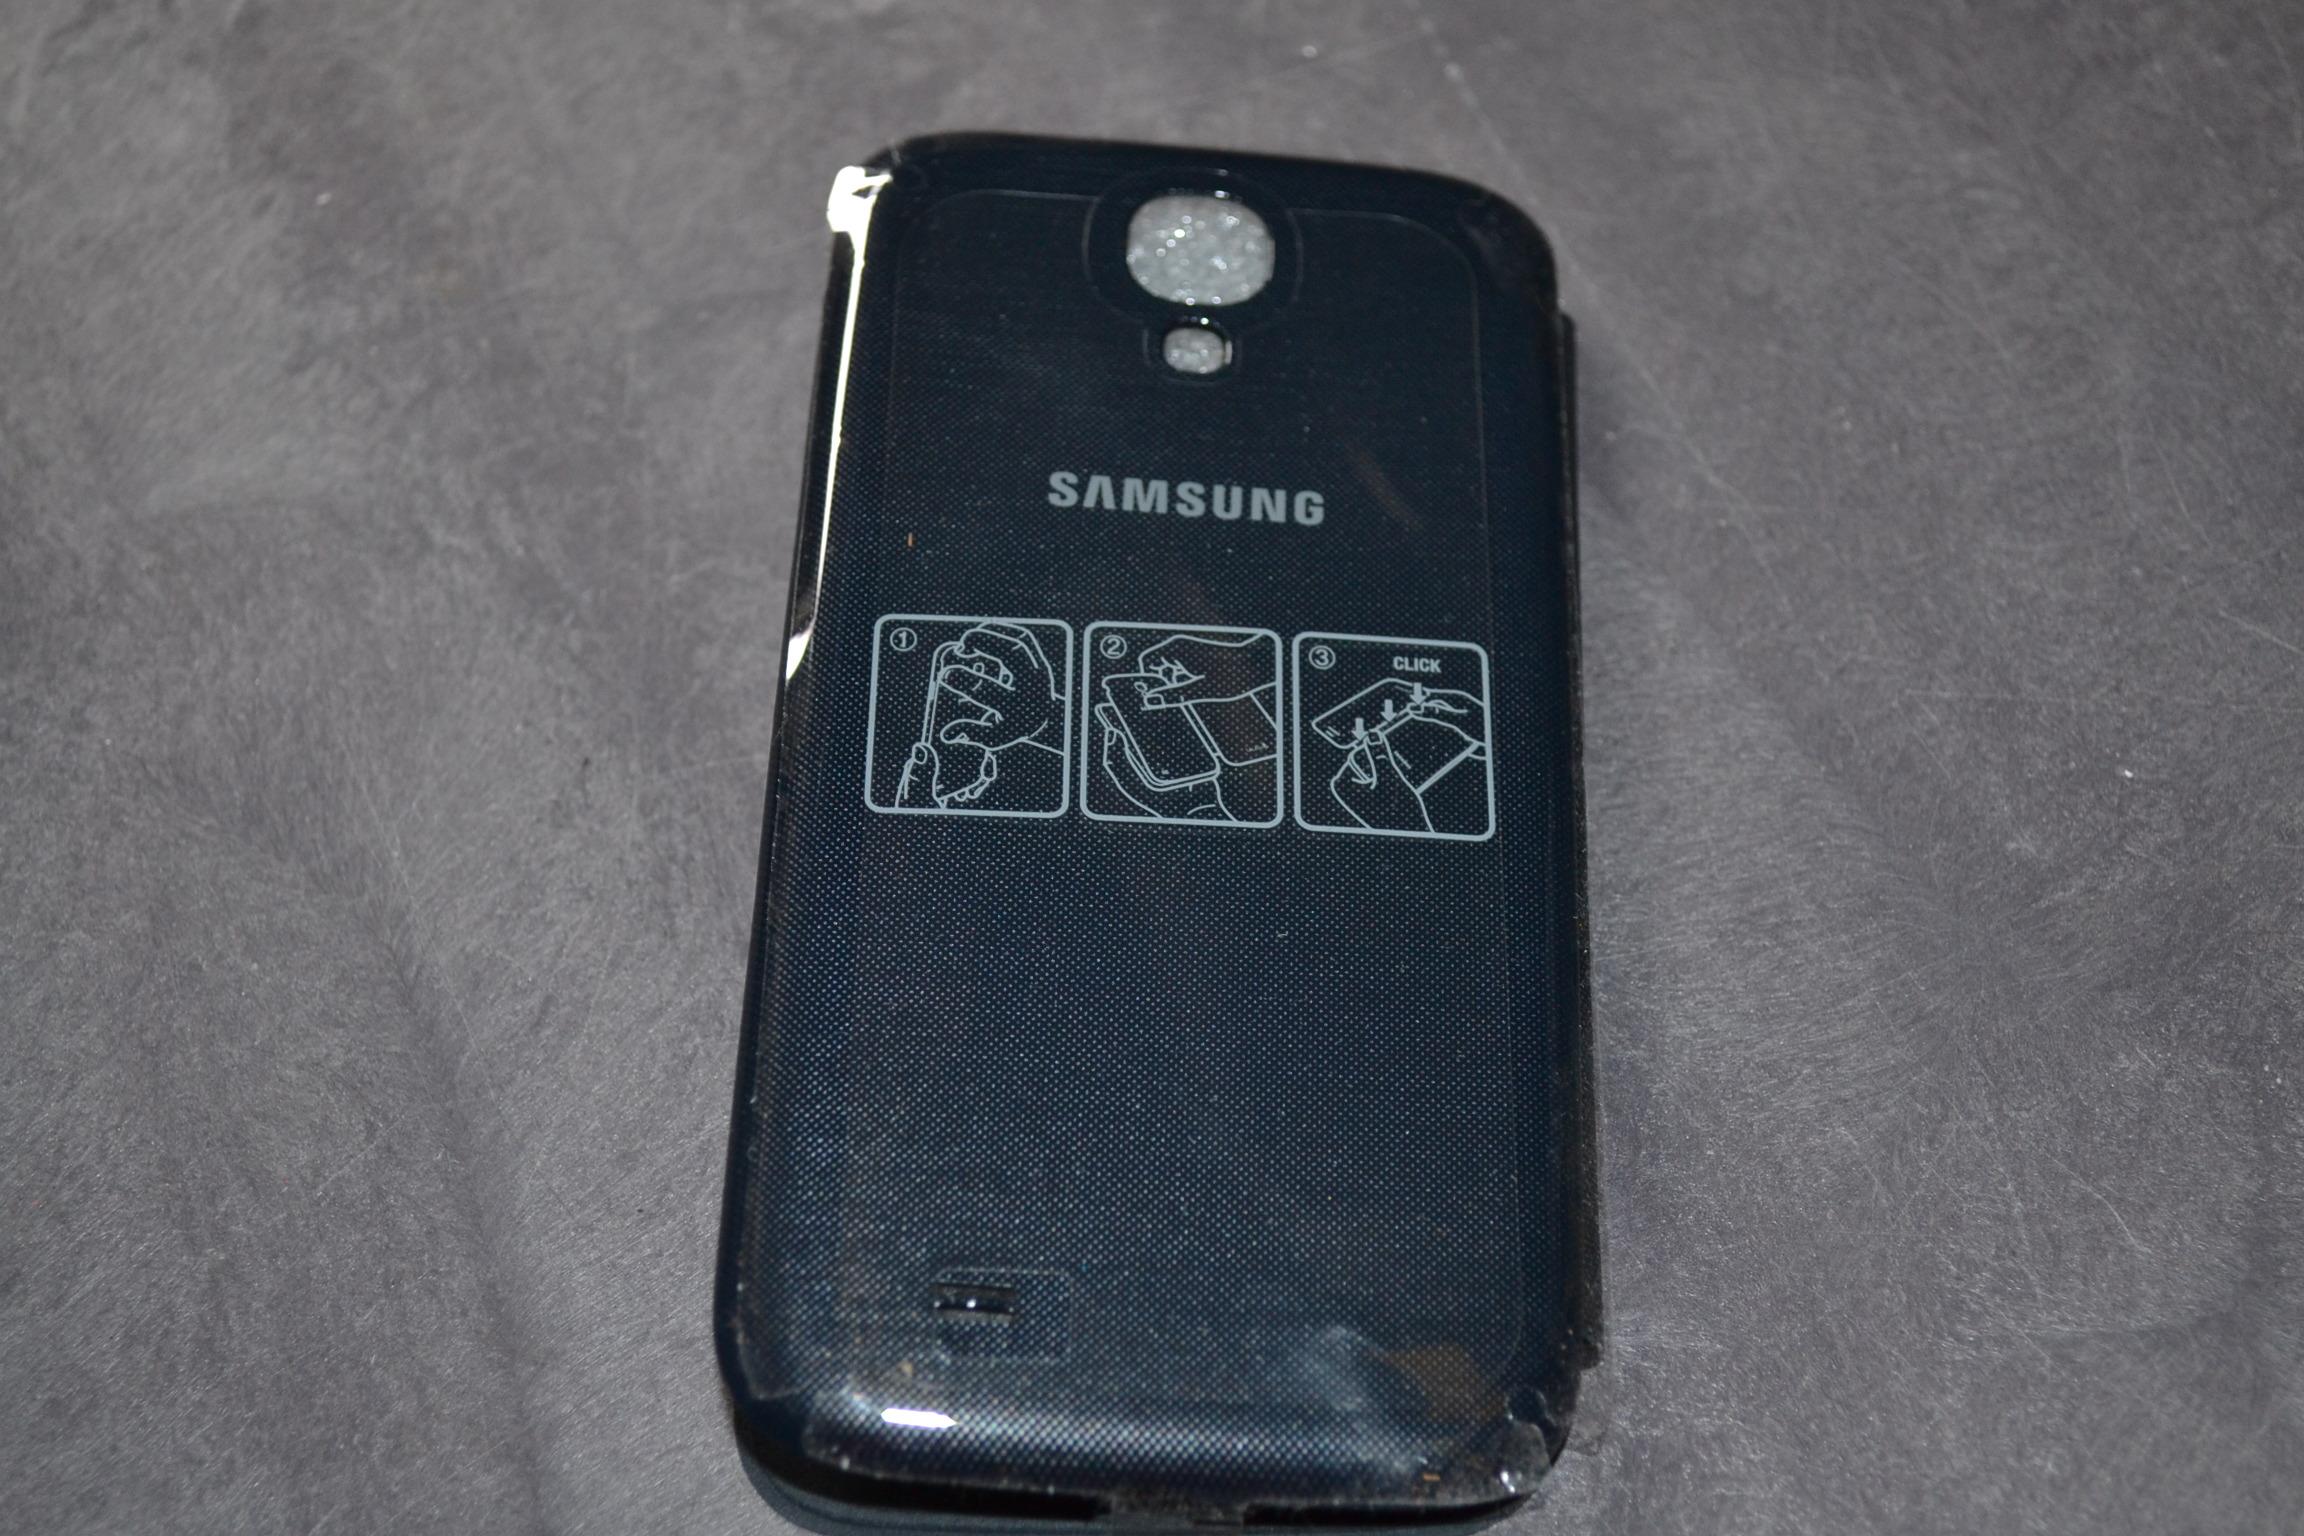 Image 2 of Samsung Galaxy S4 Flip Cover Folio Case Black Fitted EF-FI950BBESTA